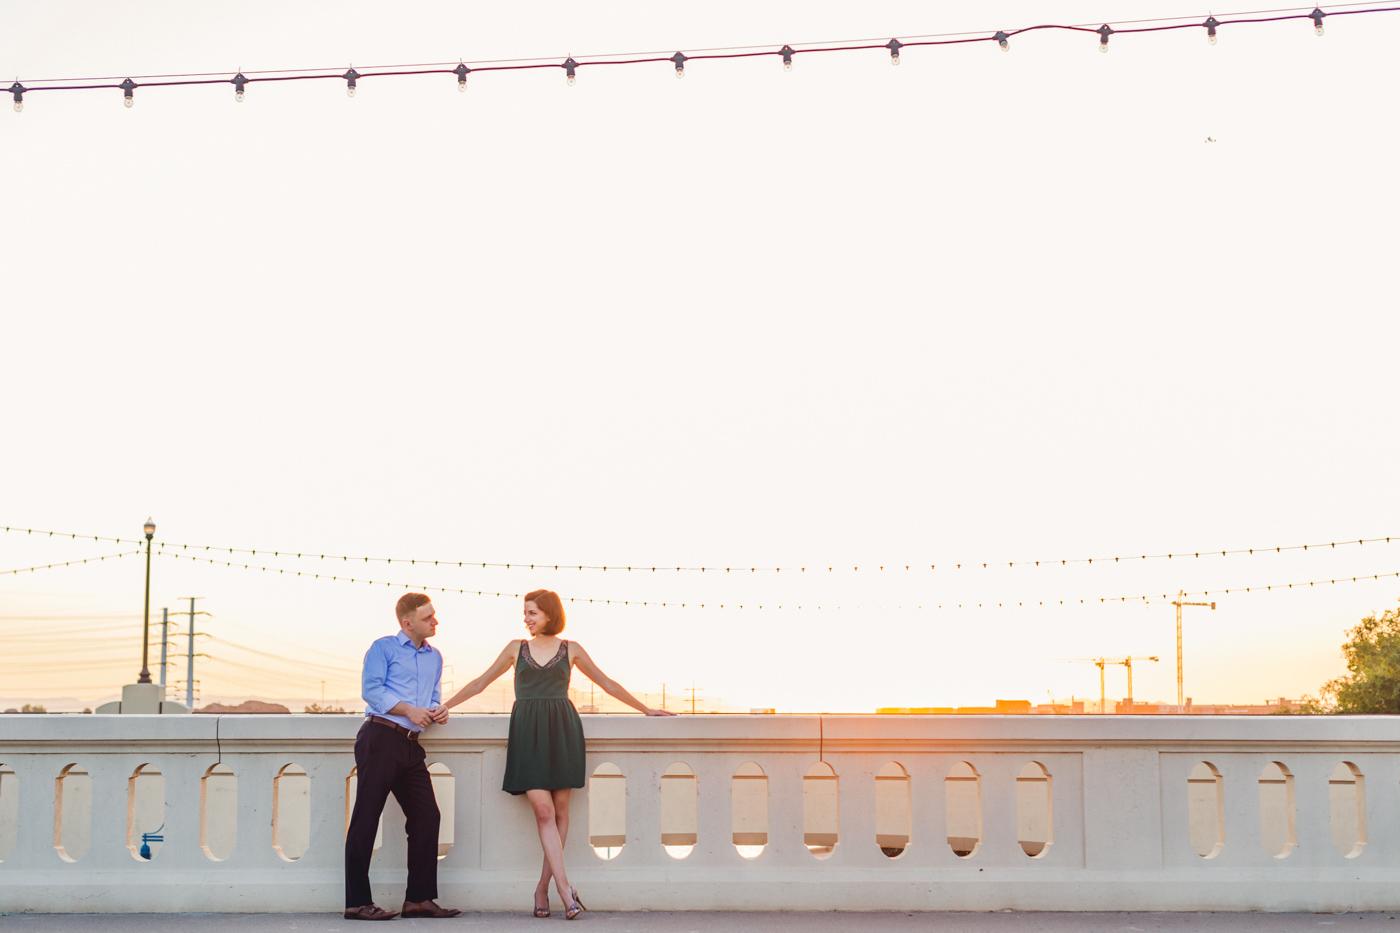 mill-avenue-bridge-engagement-session-sunrise